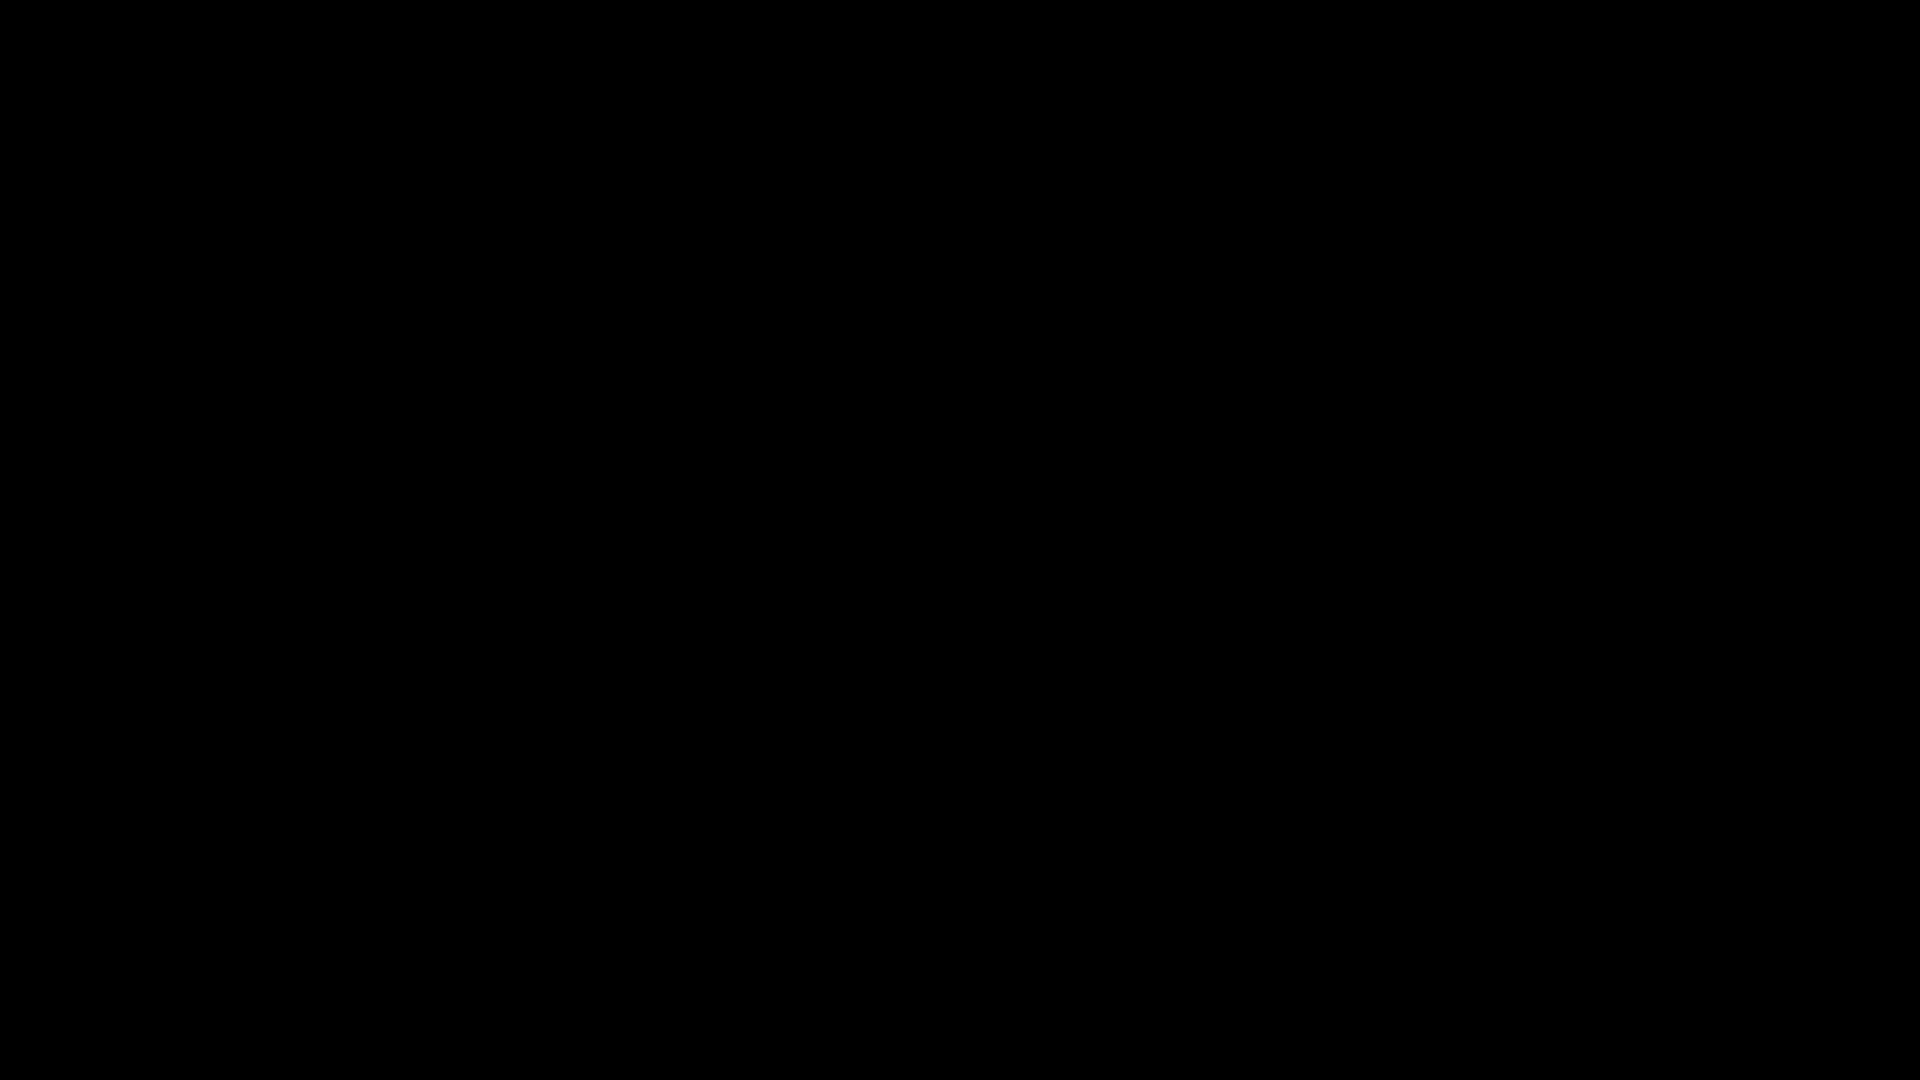 Datboi GIFs